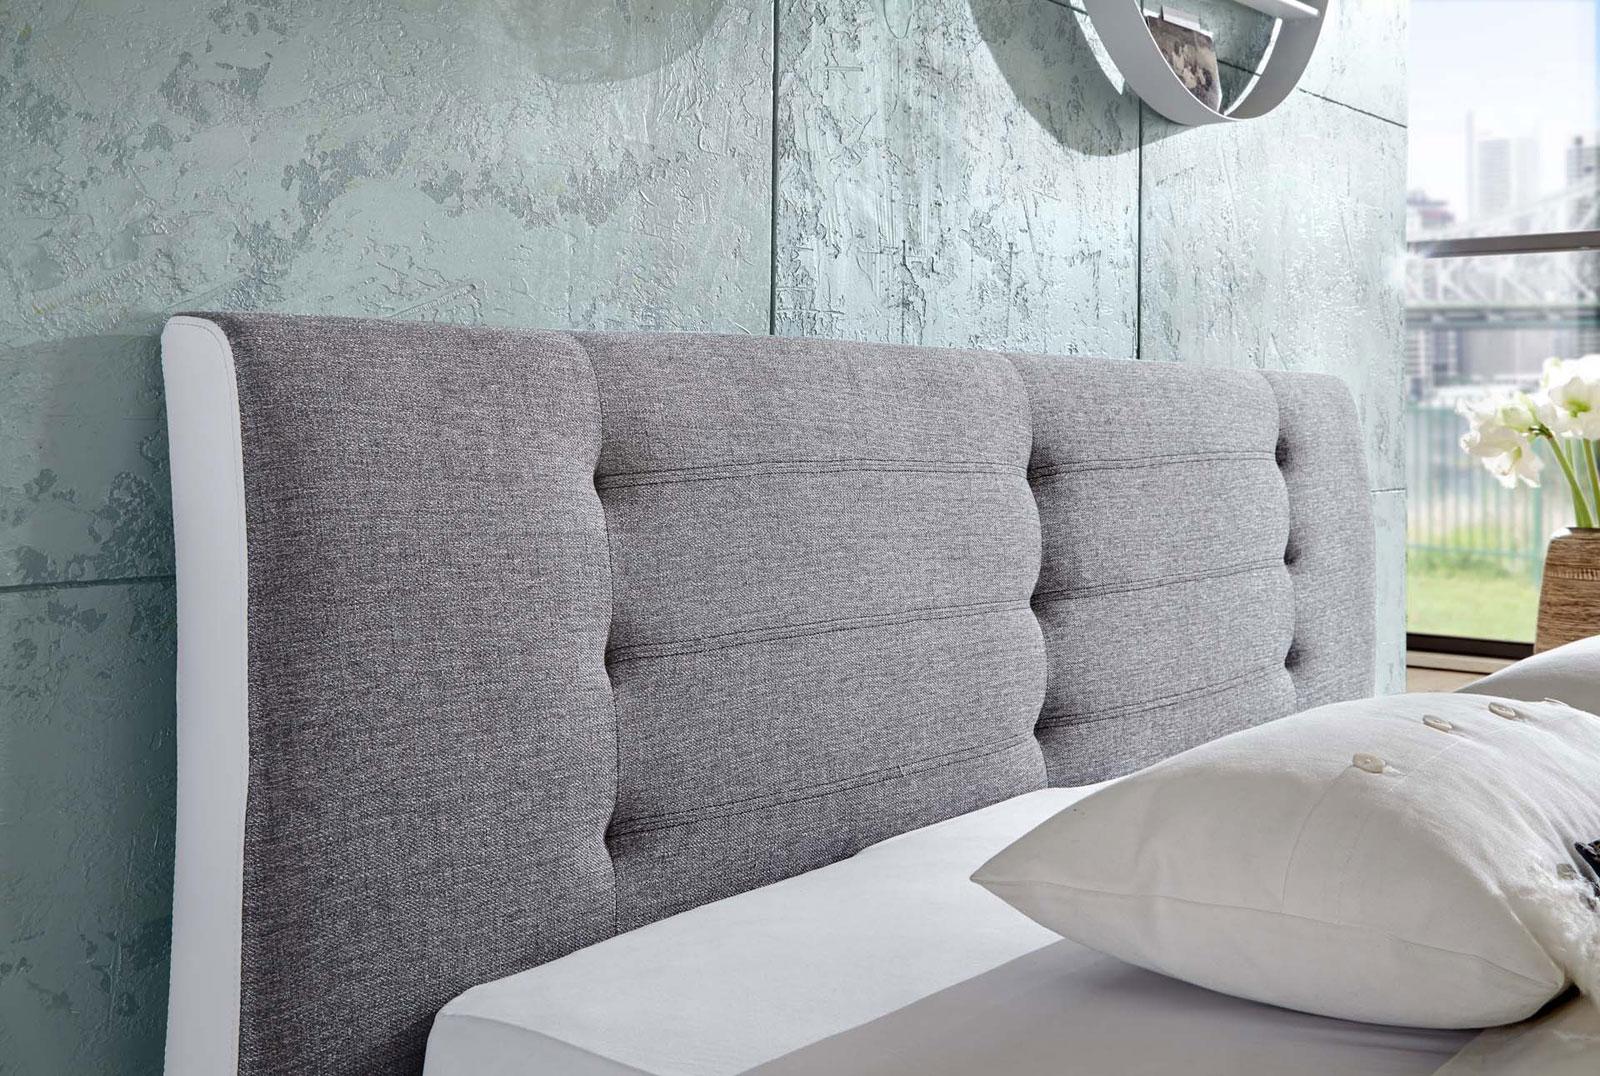 sam rundbett bebop 180 x 200 cm wei grau auf lager. Black Bedroom Furniture Sets. Home Design Ideas